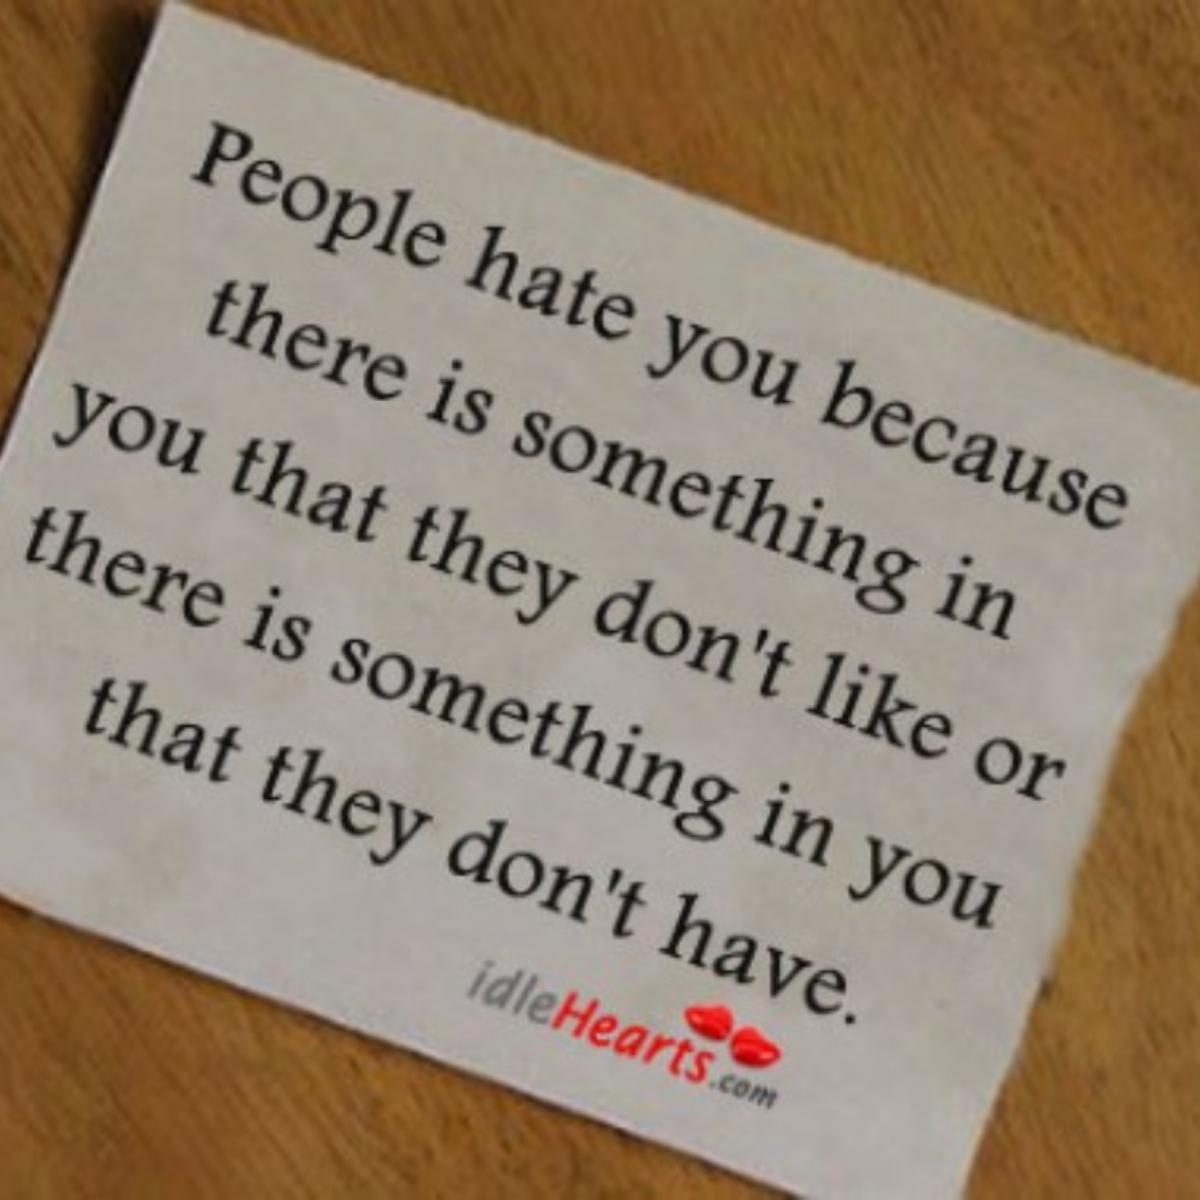 when-someone-dislikes-you